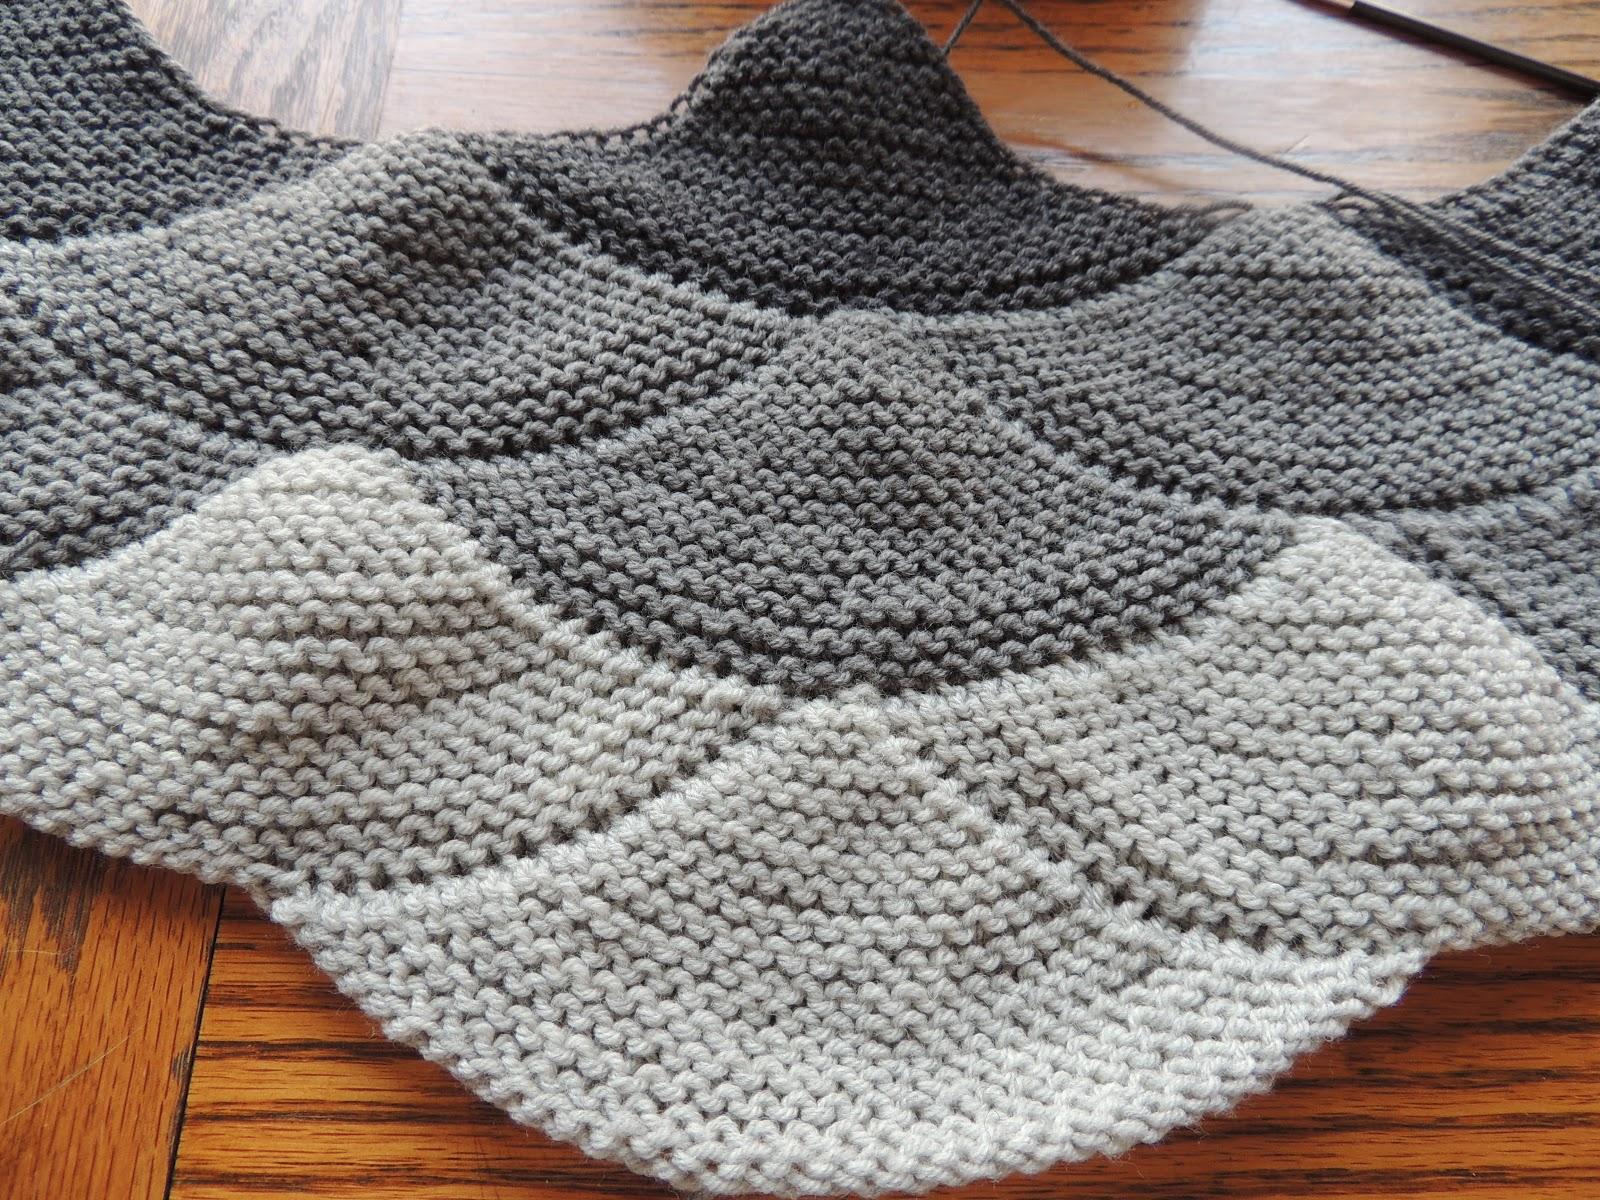 Knitting Inspiration Ig : Dudesthatknit